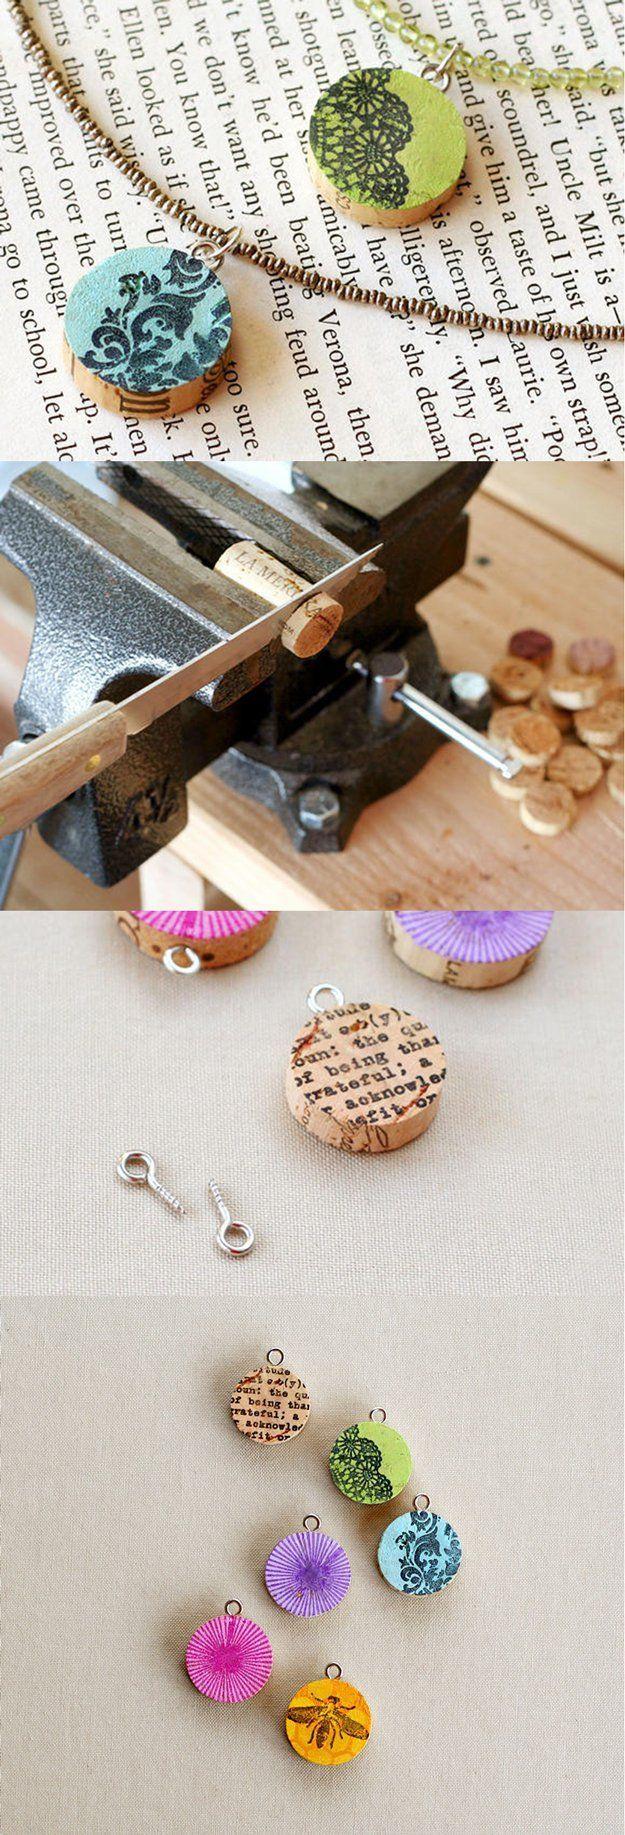 43 More DIY Wine Cork Crafts Ideas DIYReady.com | Easy DIY Crafts, Fun Projects, & DIY Craft Ideas For Kids & Adults